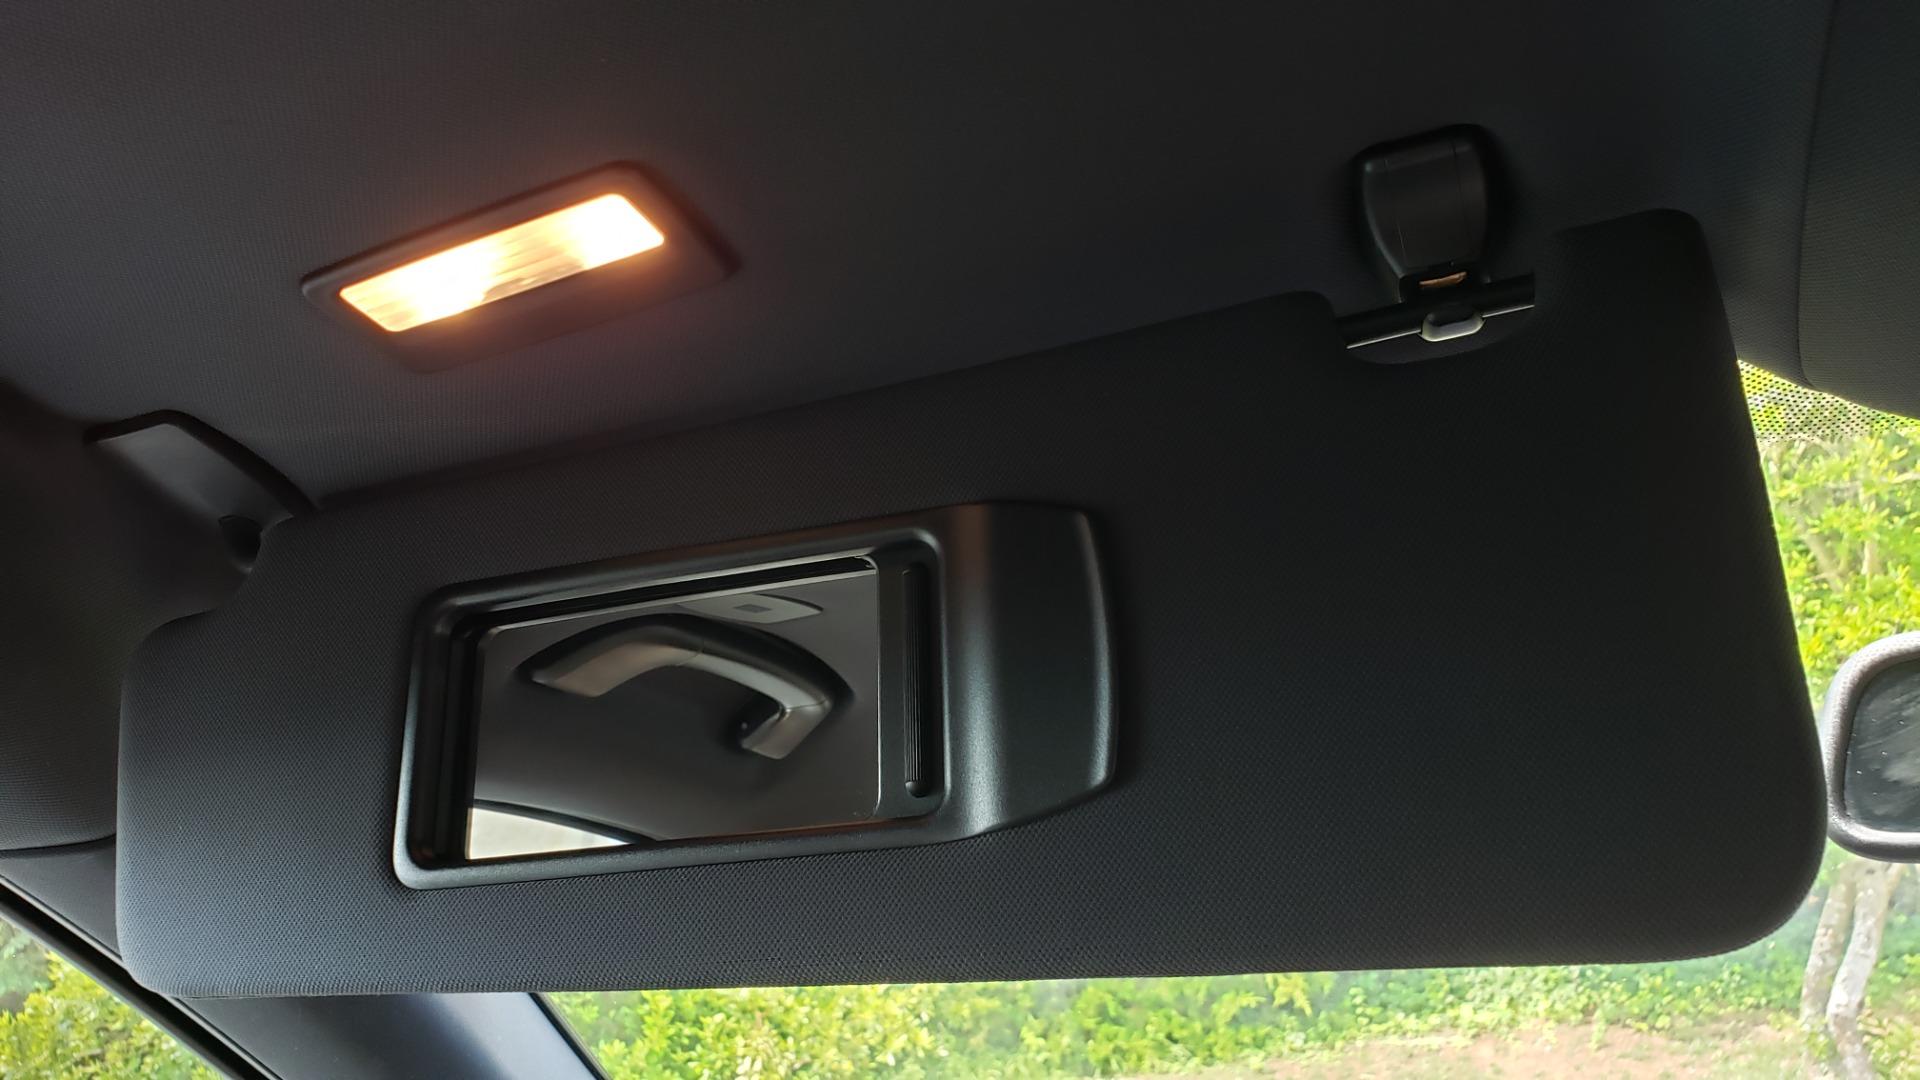 Used 2014 BMW 7 SERIES 750LI M-SPORT / EXEC PKG / DRVR ASST / LIGHTING / NAV / SUNROOF for sale Sold at Formula Imports in Charlotte NC 28227 50